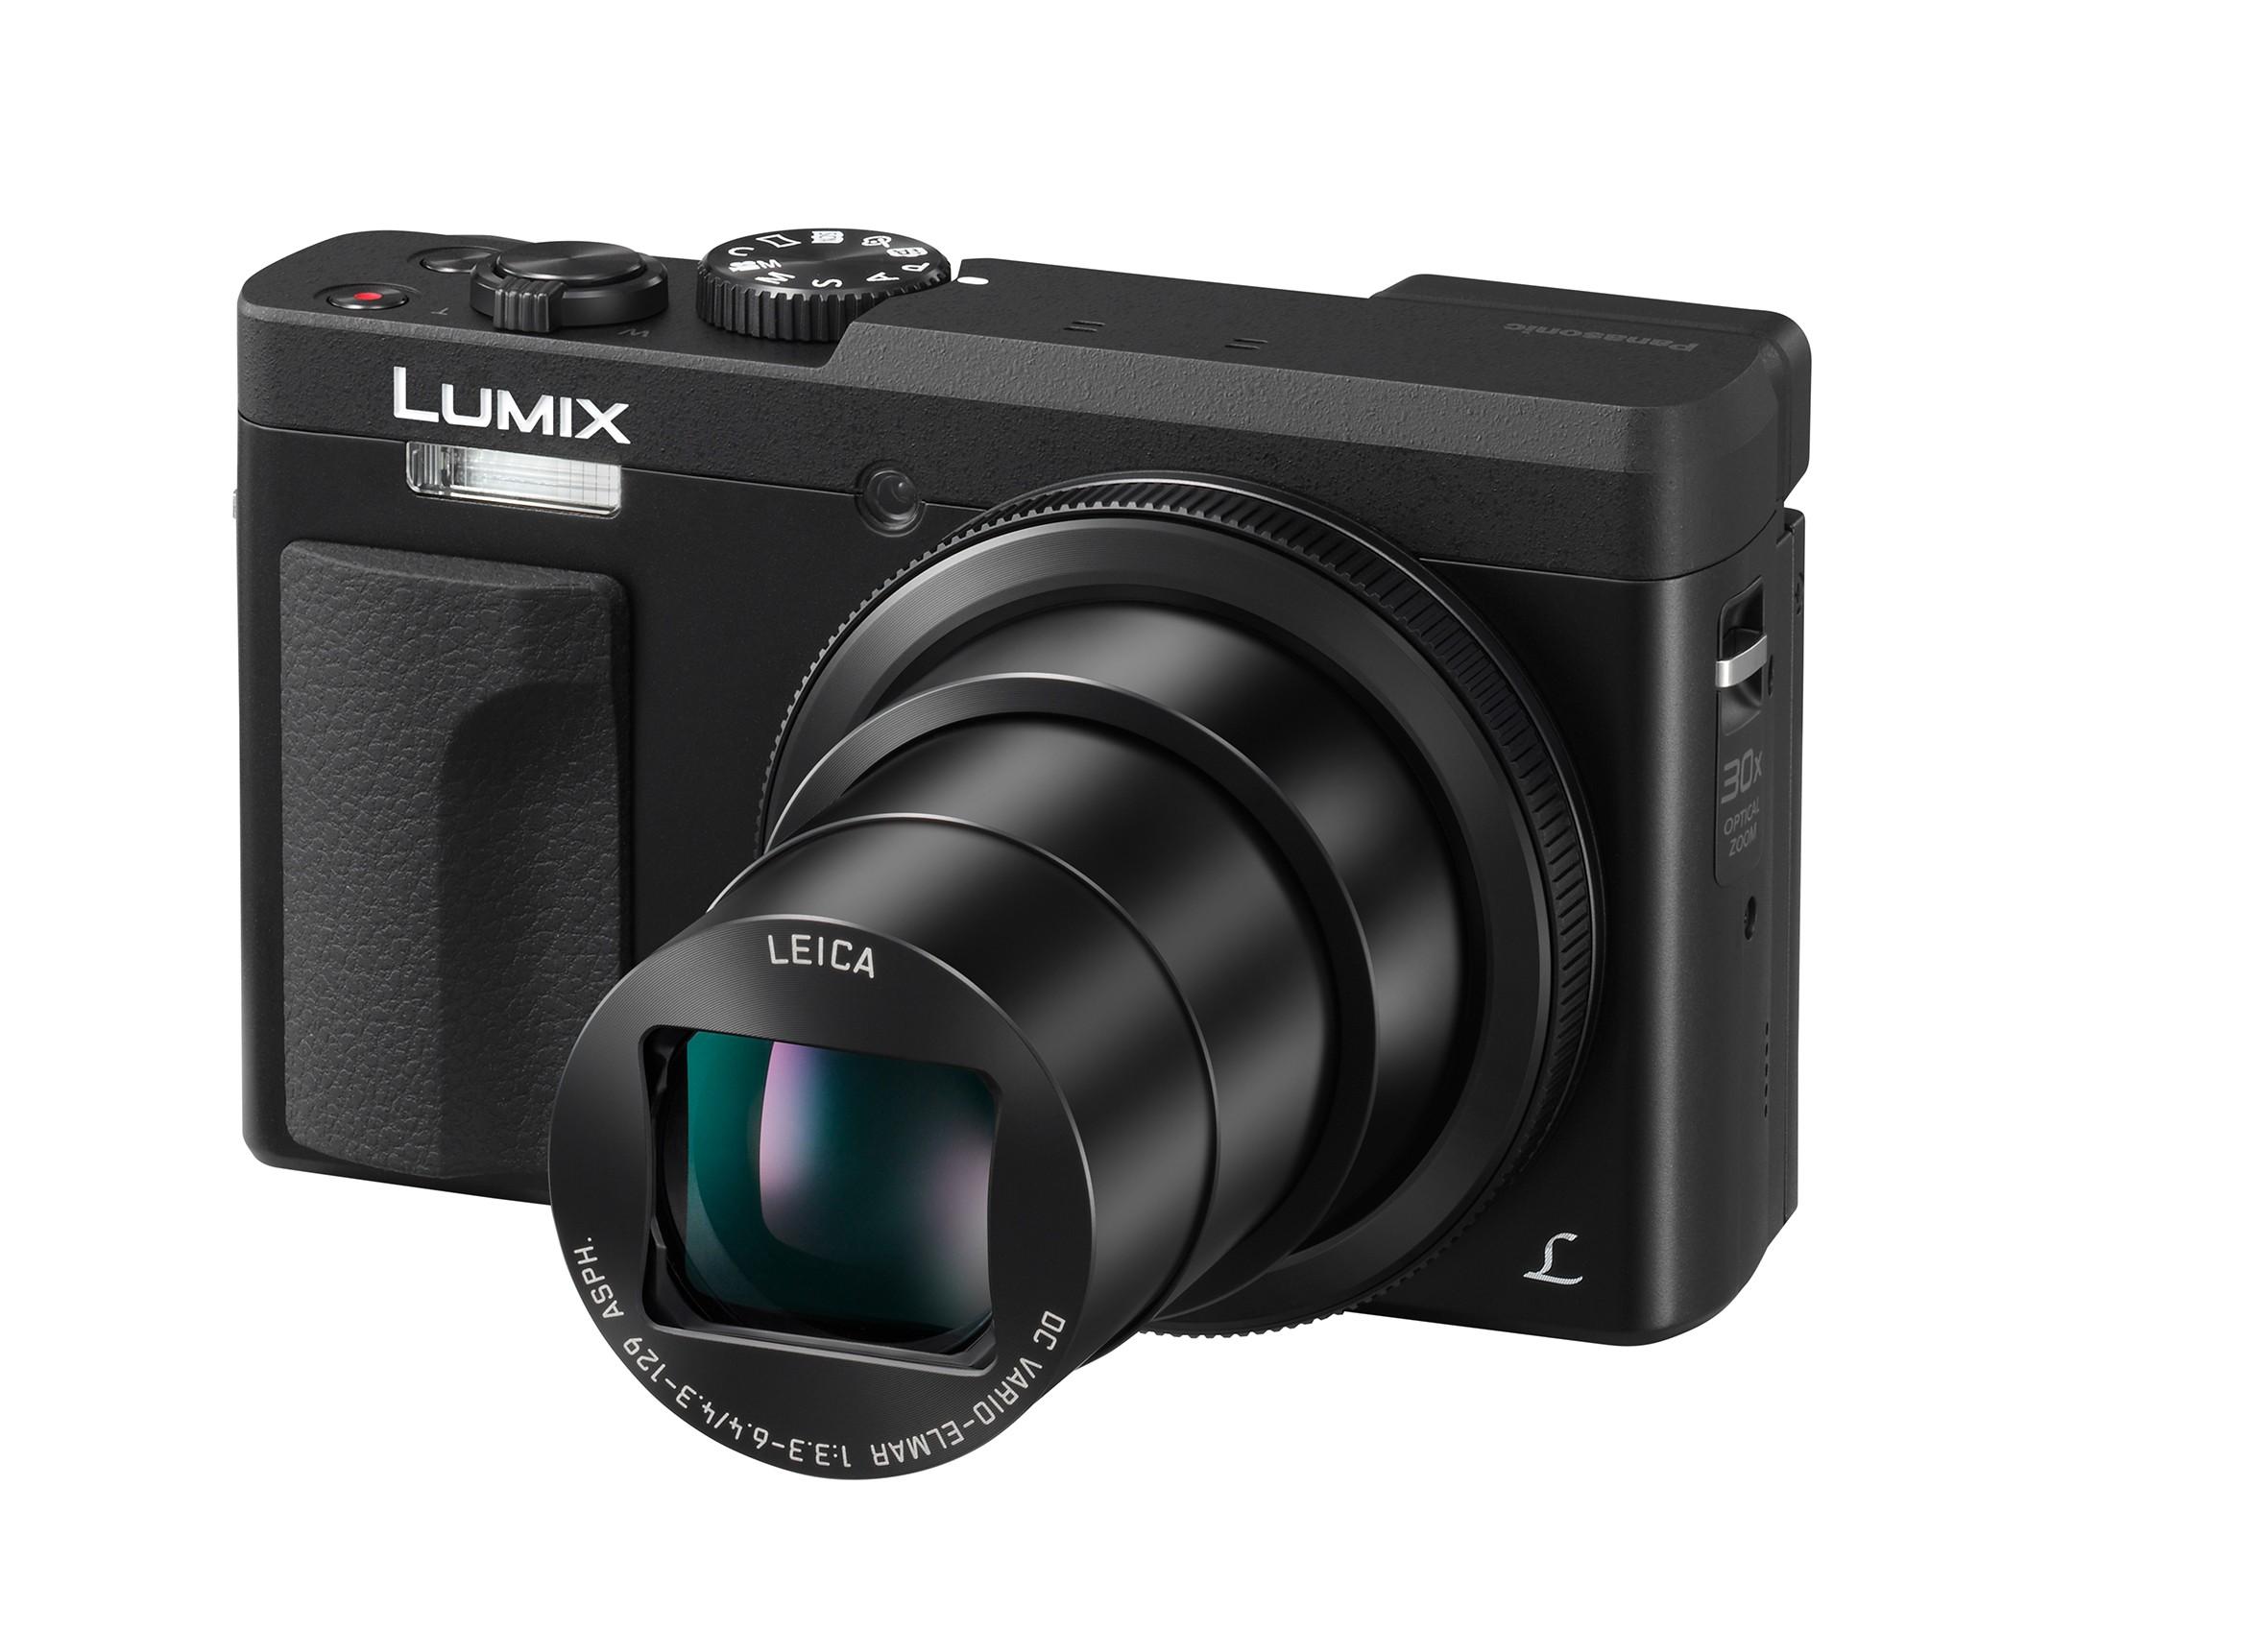 KERDEJAR Cubierta de Zapata BS-1 para Canon Nikon Olympus Pentax Panasonic